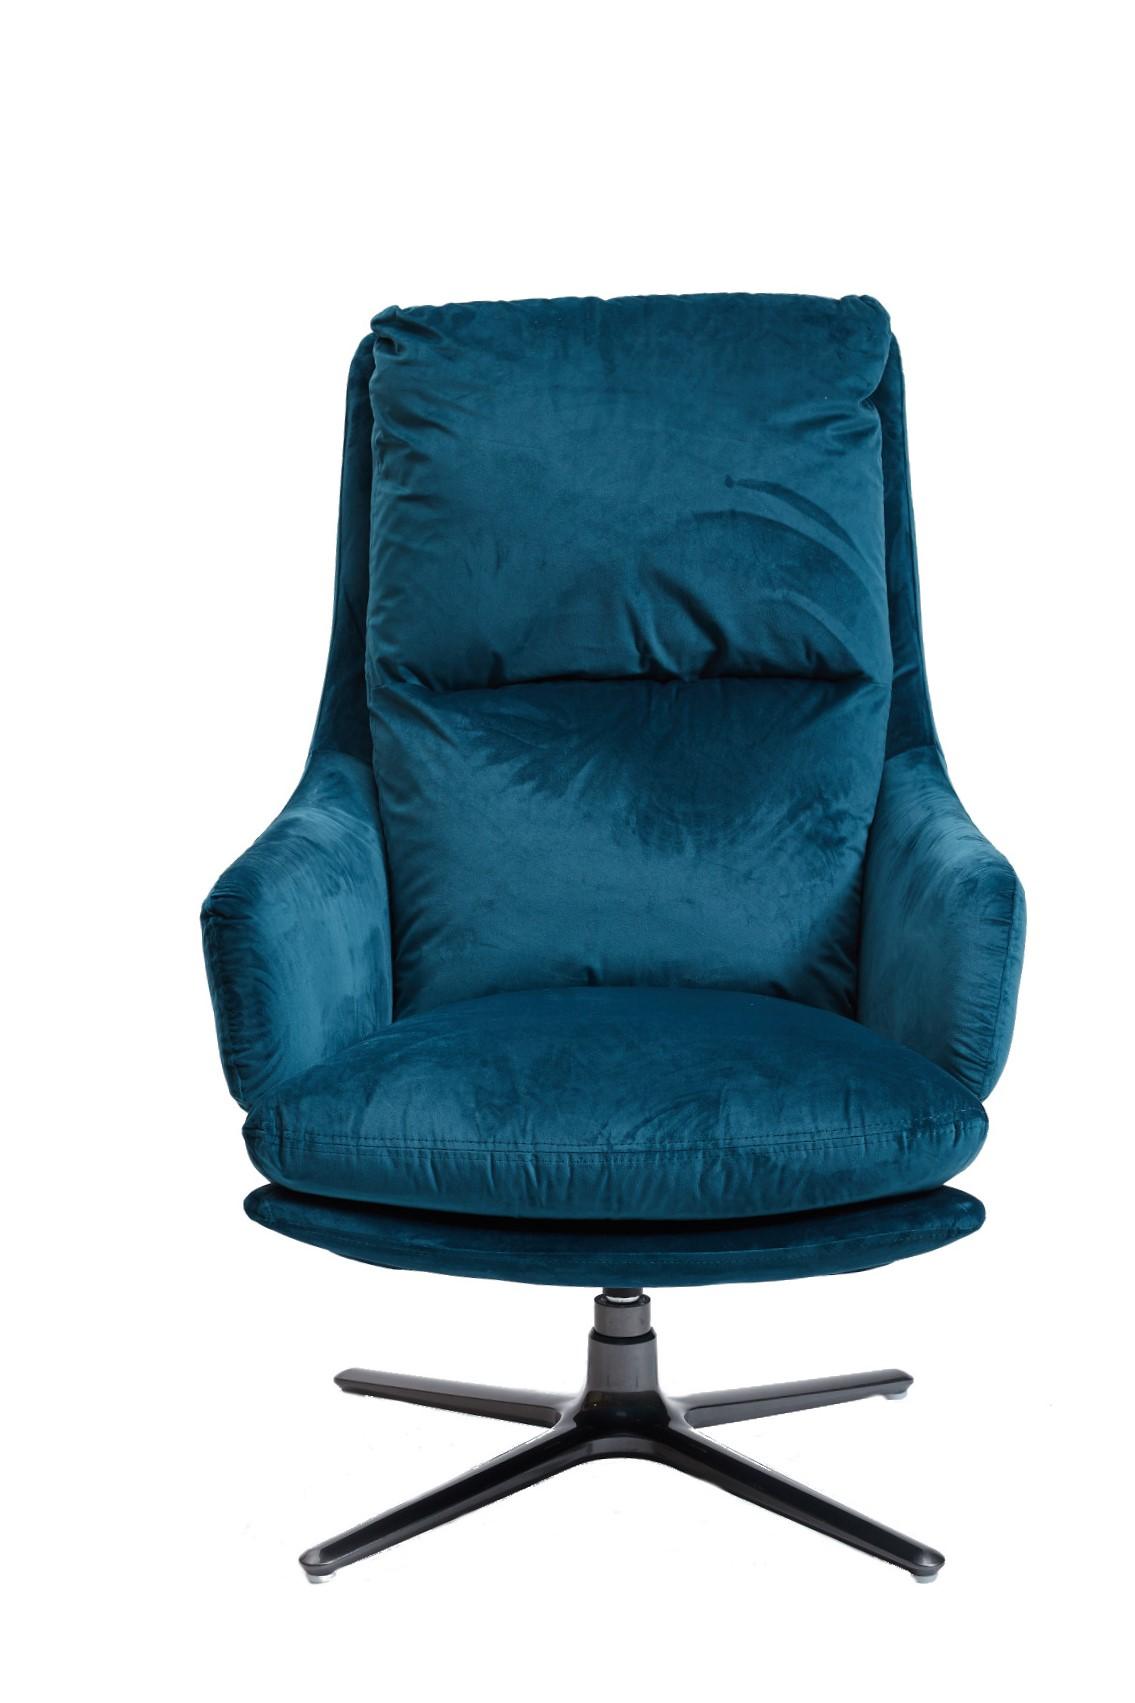 Compton Swivel Chair